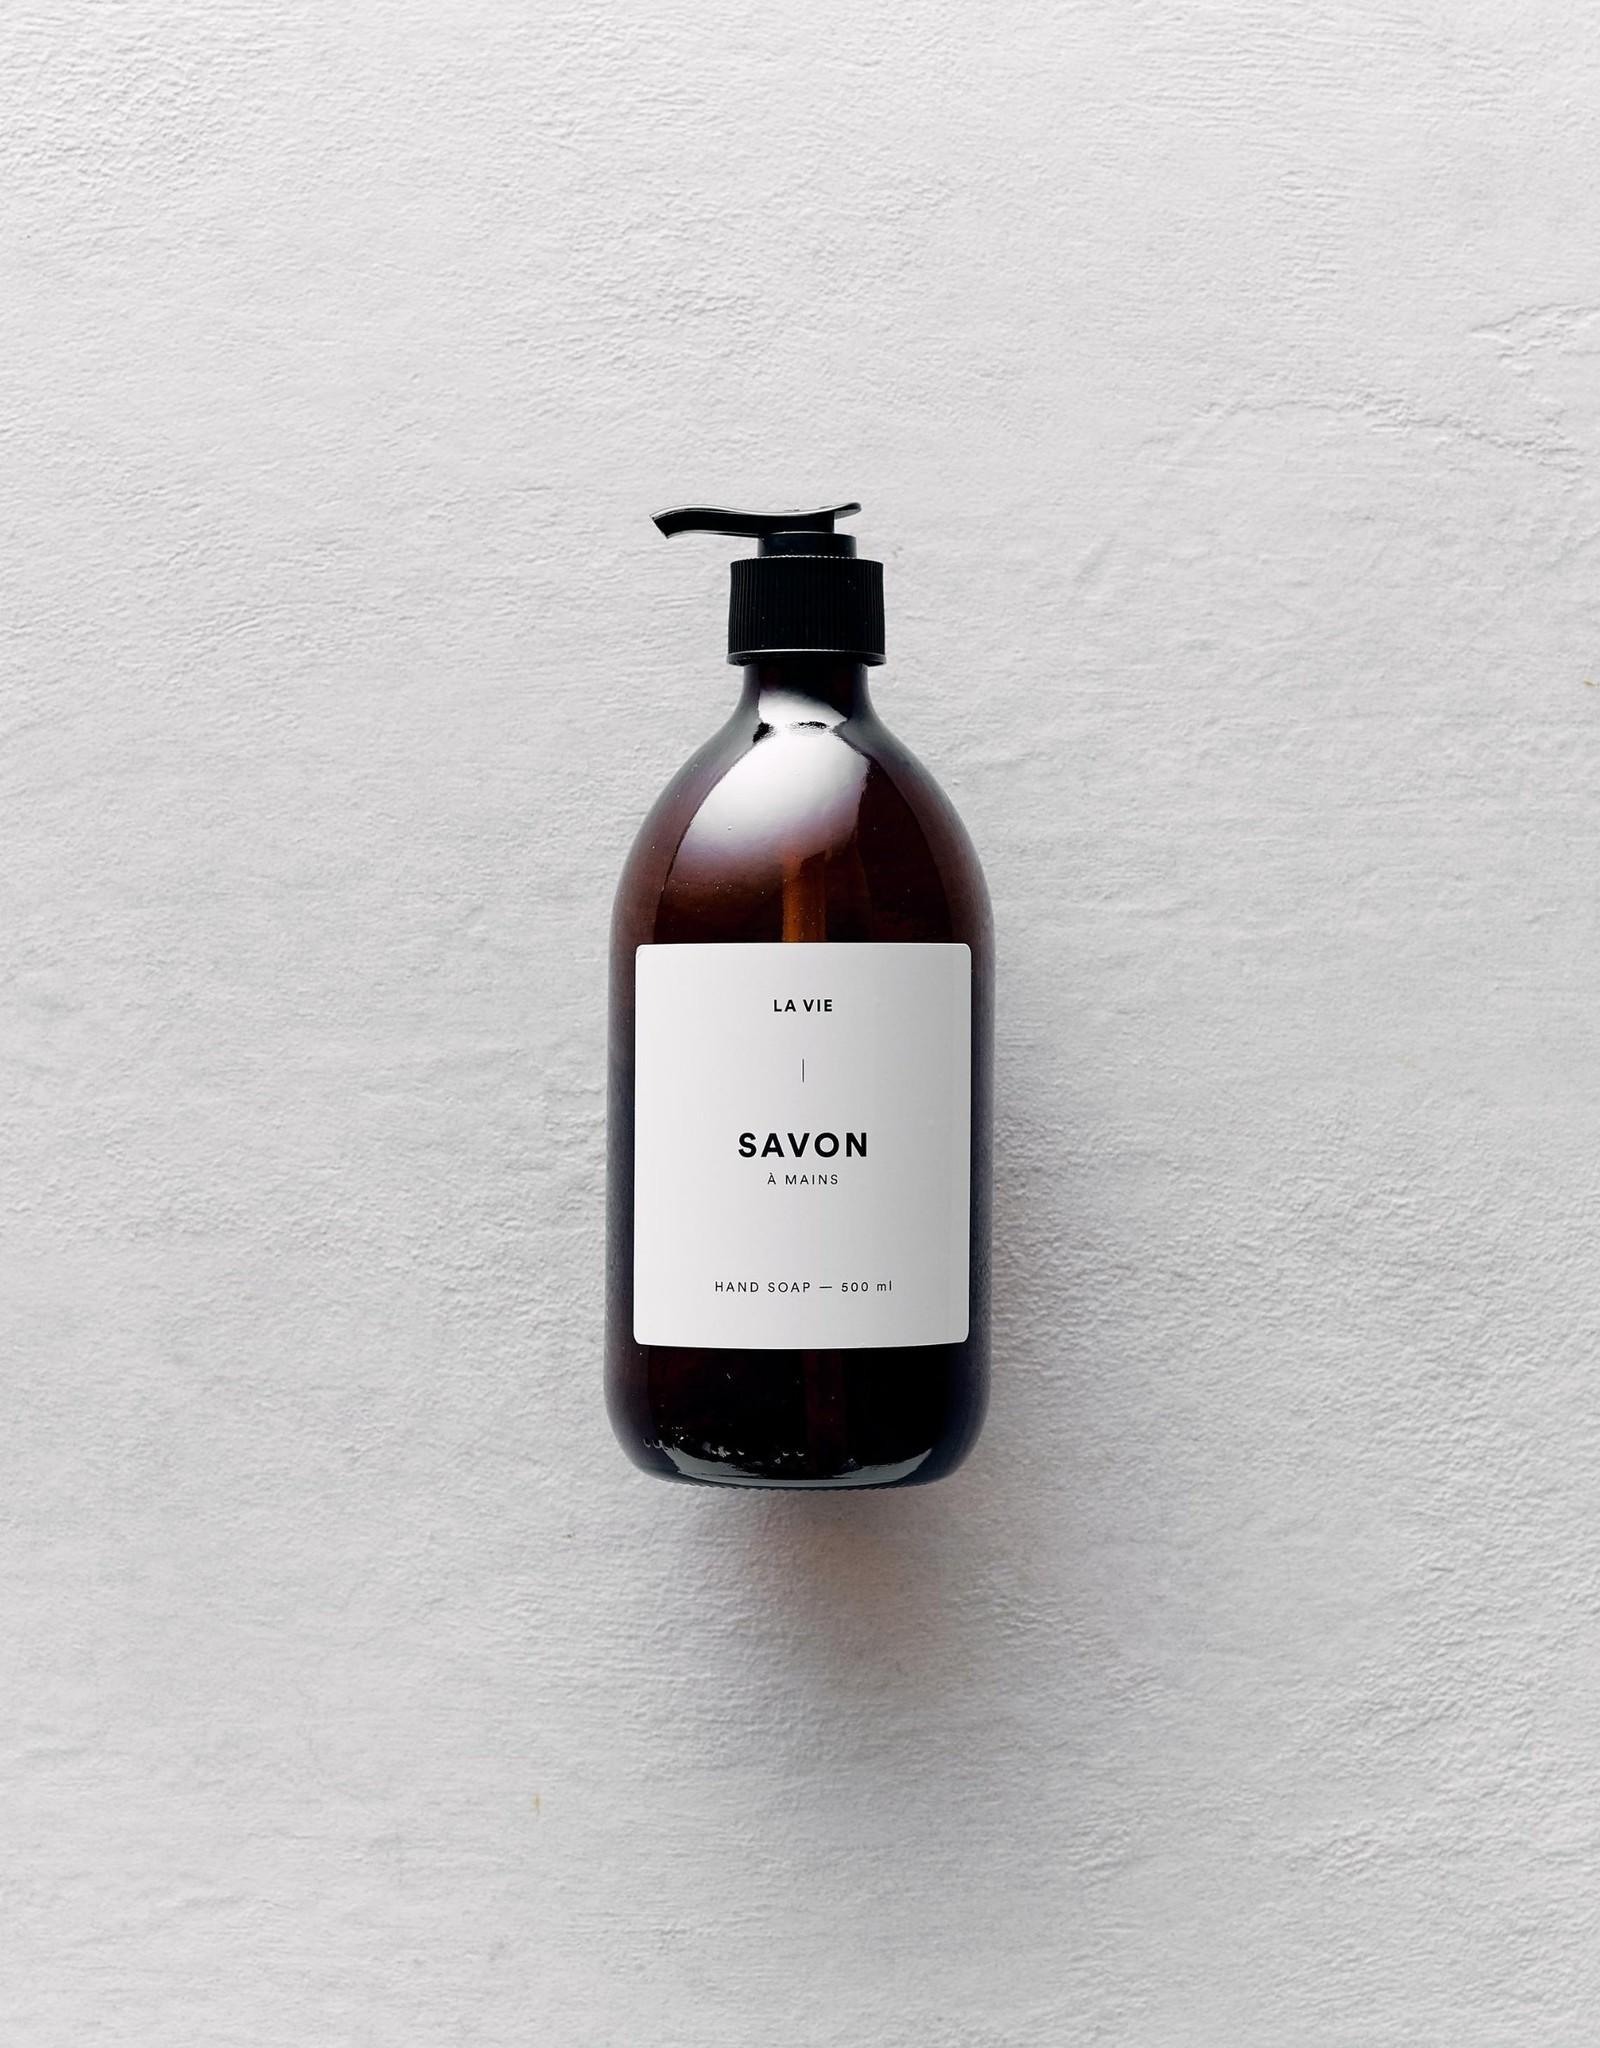 Hand Soap Rosemary Grapefruit